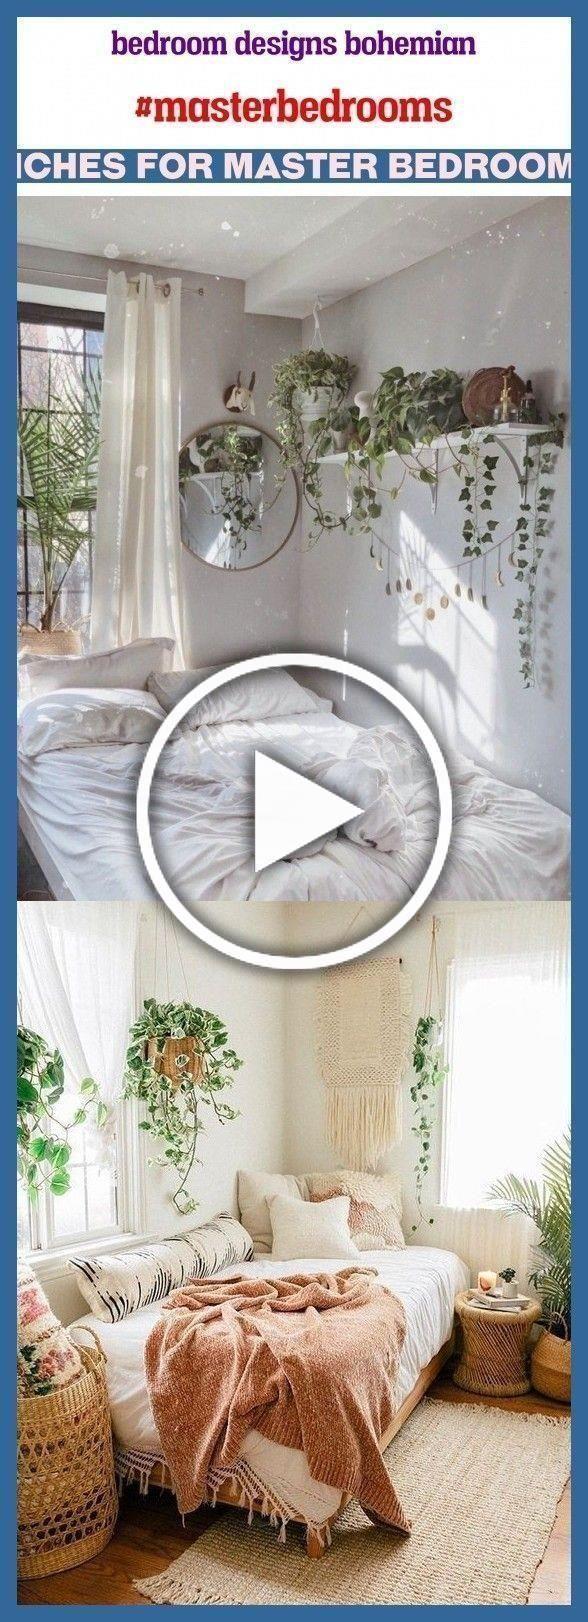 #bedroom ideas master on a budget boho #bedroom ideas for ... on Bohemian Bedroom Ideas On A Budget  id=46000